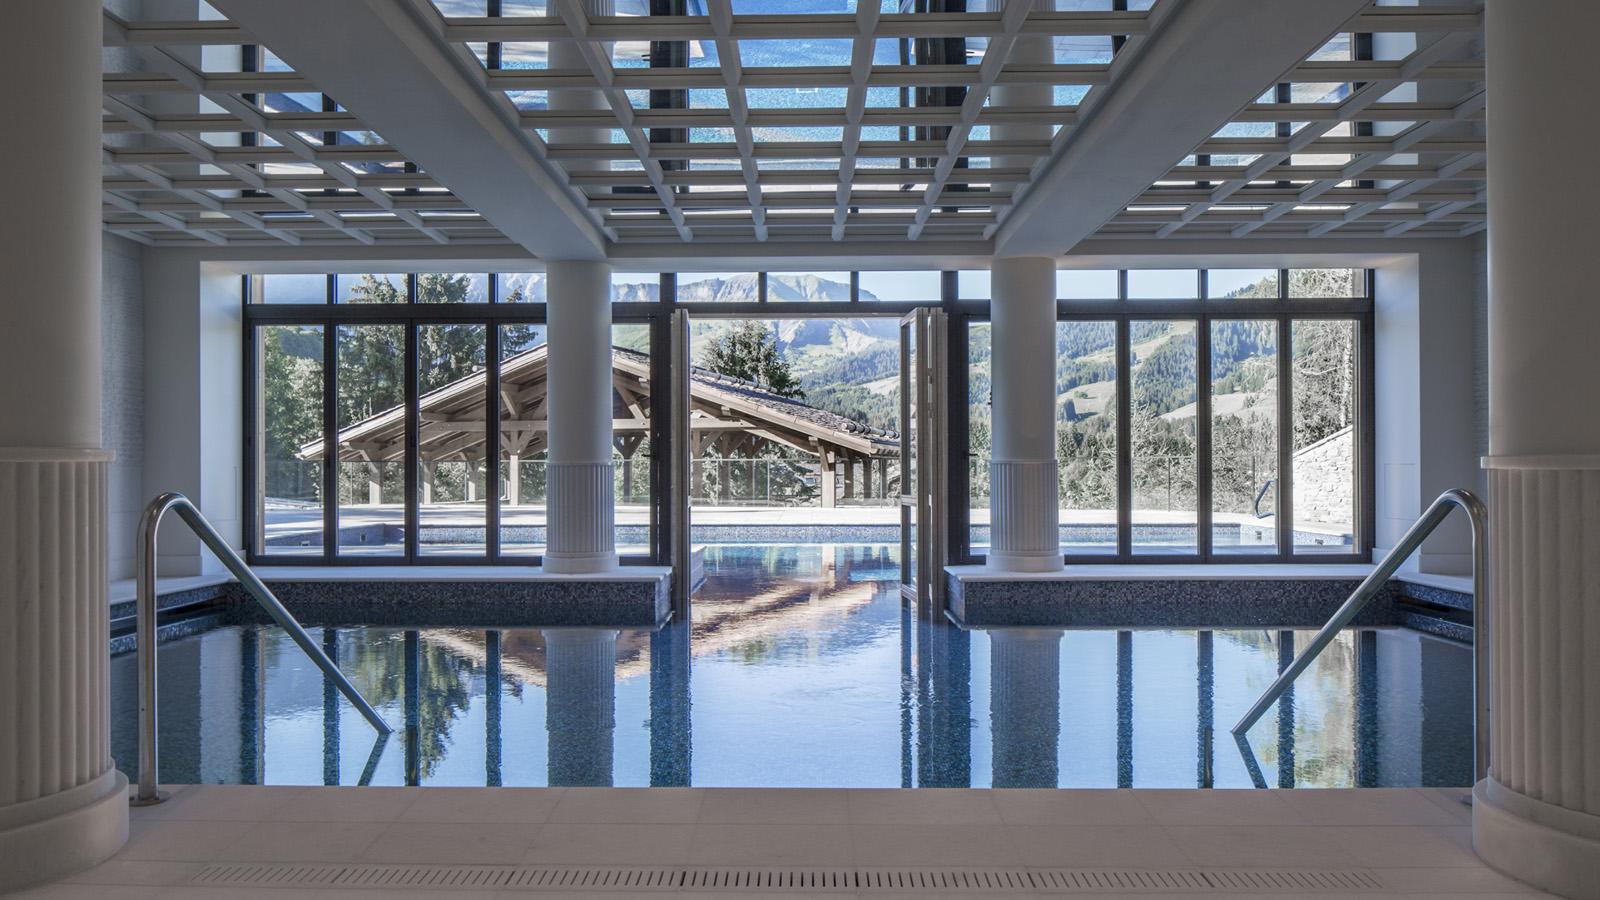 The beautiful indoor outdoor pool © Four Seasons